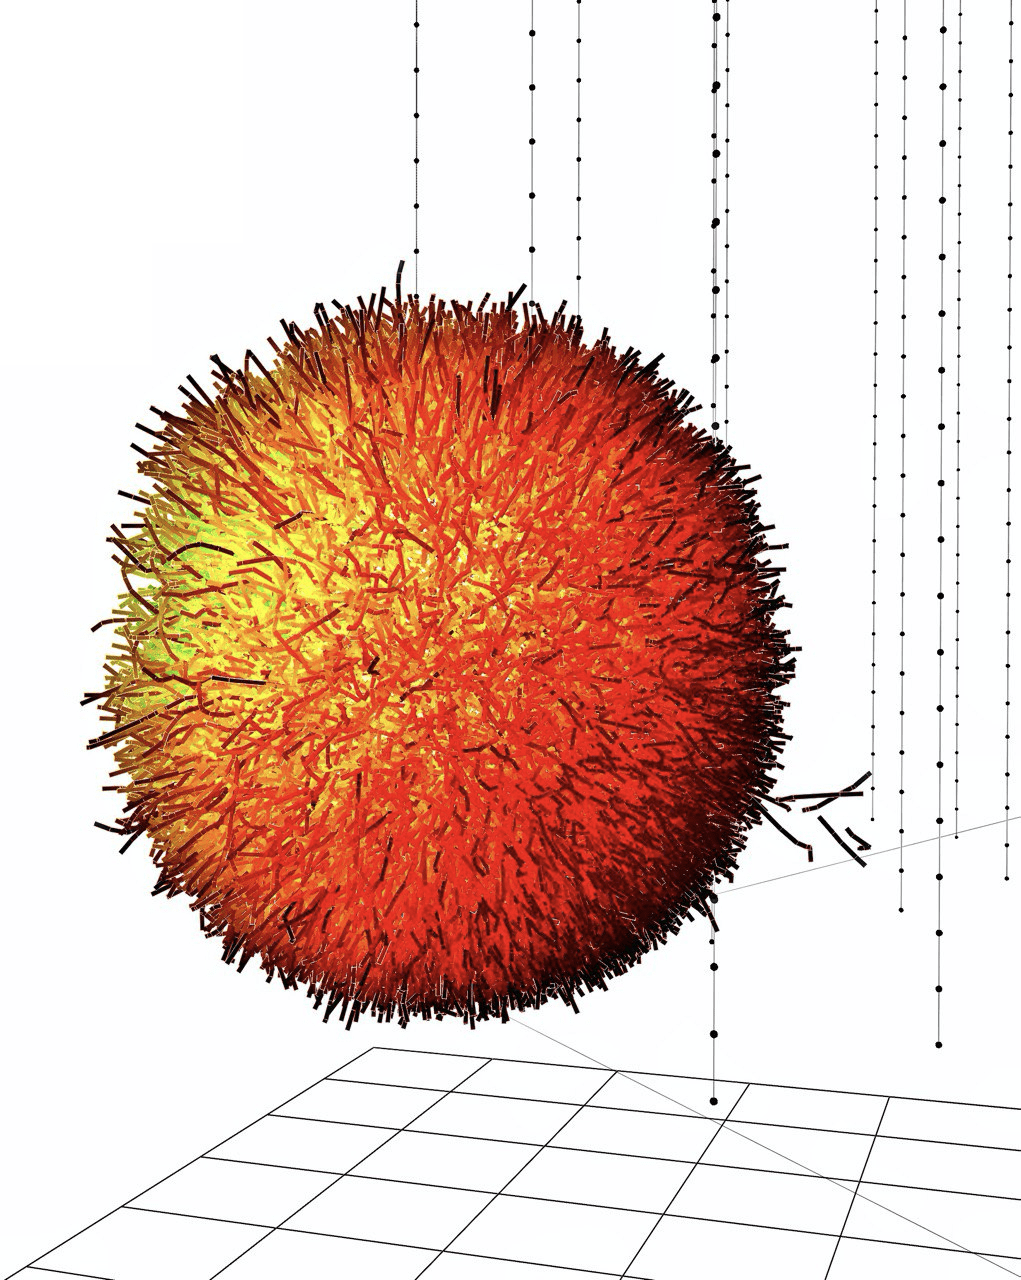 Simulation of the Glashow event photon burst